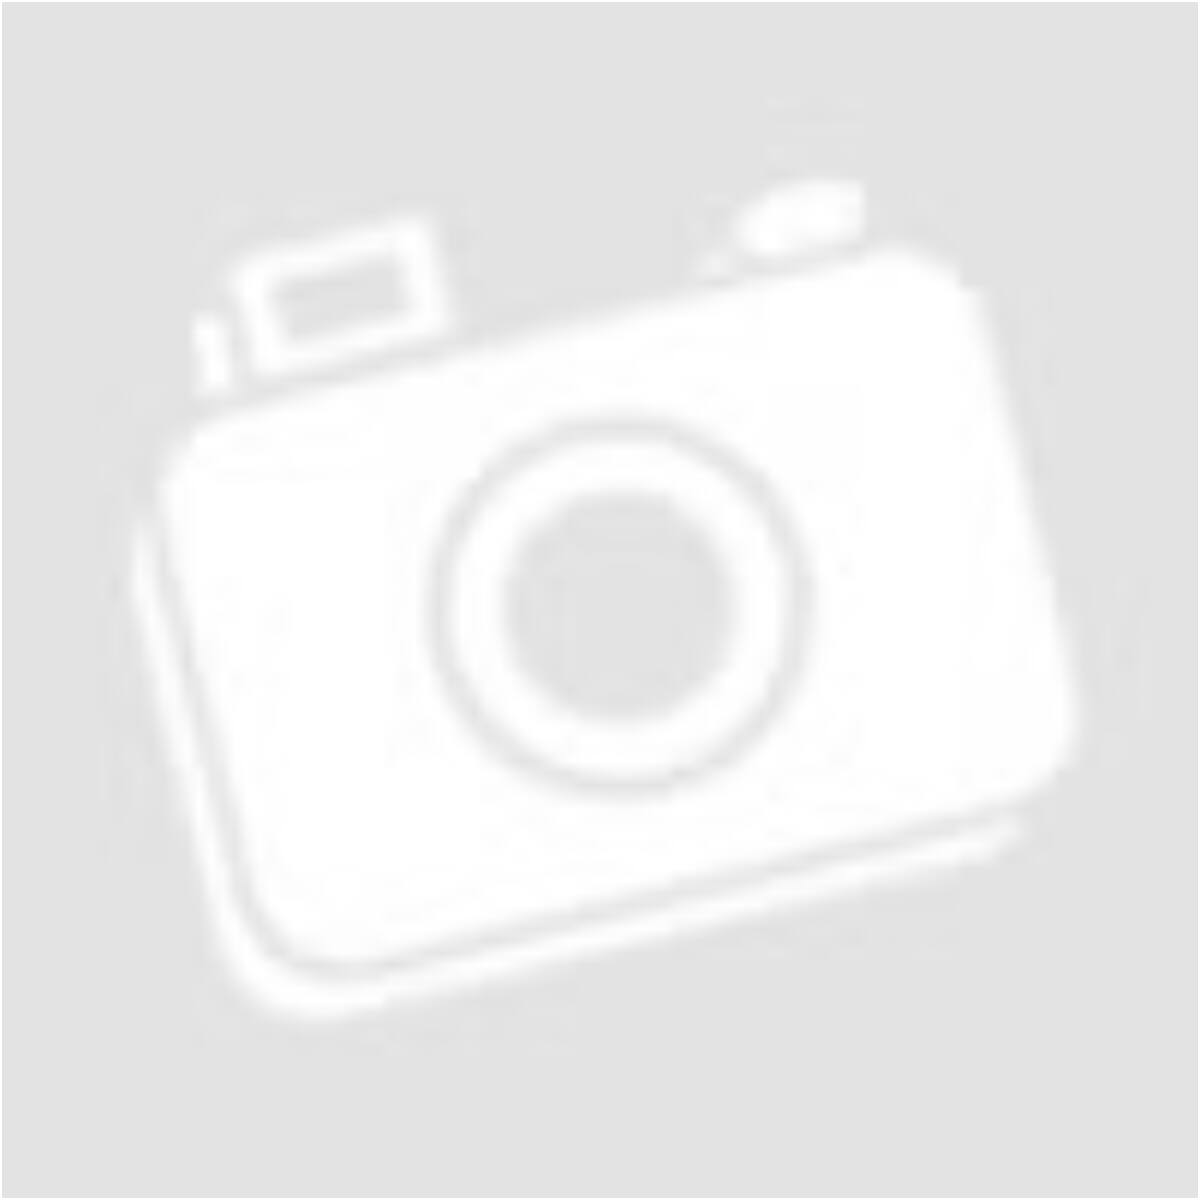 ingyenes fasz fotókat